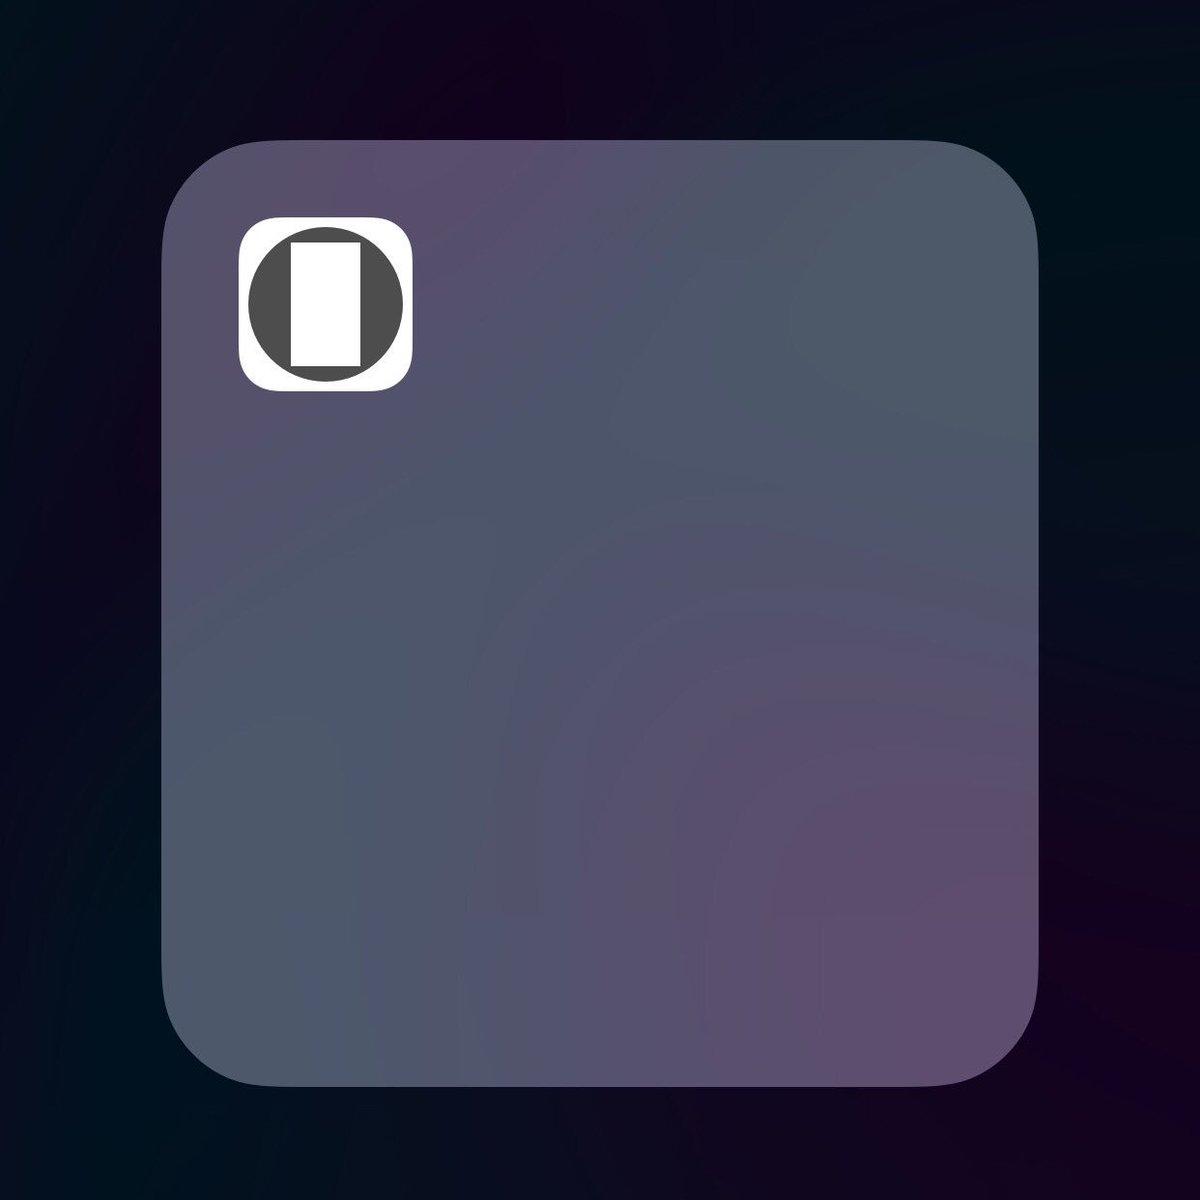 Hide Mysterious Iphone Wallpaper 不思議なiphone壁紙 No Twitter ダークネオンのiphone壁紙 細かい仕掛けに拘りました 不思議なiphone壁紙のブログhttps T Co 0lydelyhi0 サイト直行 棚無し 棚壁紙有り T Co Gzqihld8ip